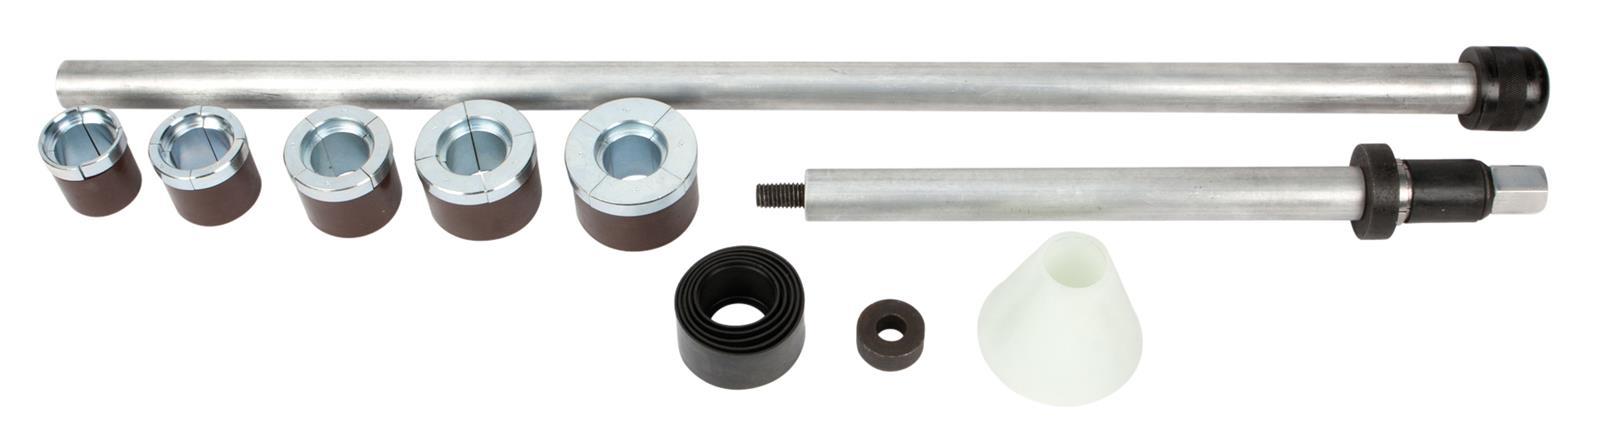 Performance Tool Universal Camshaft Bearing Installation Tools W89220